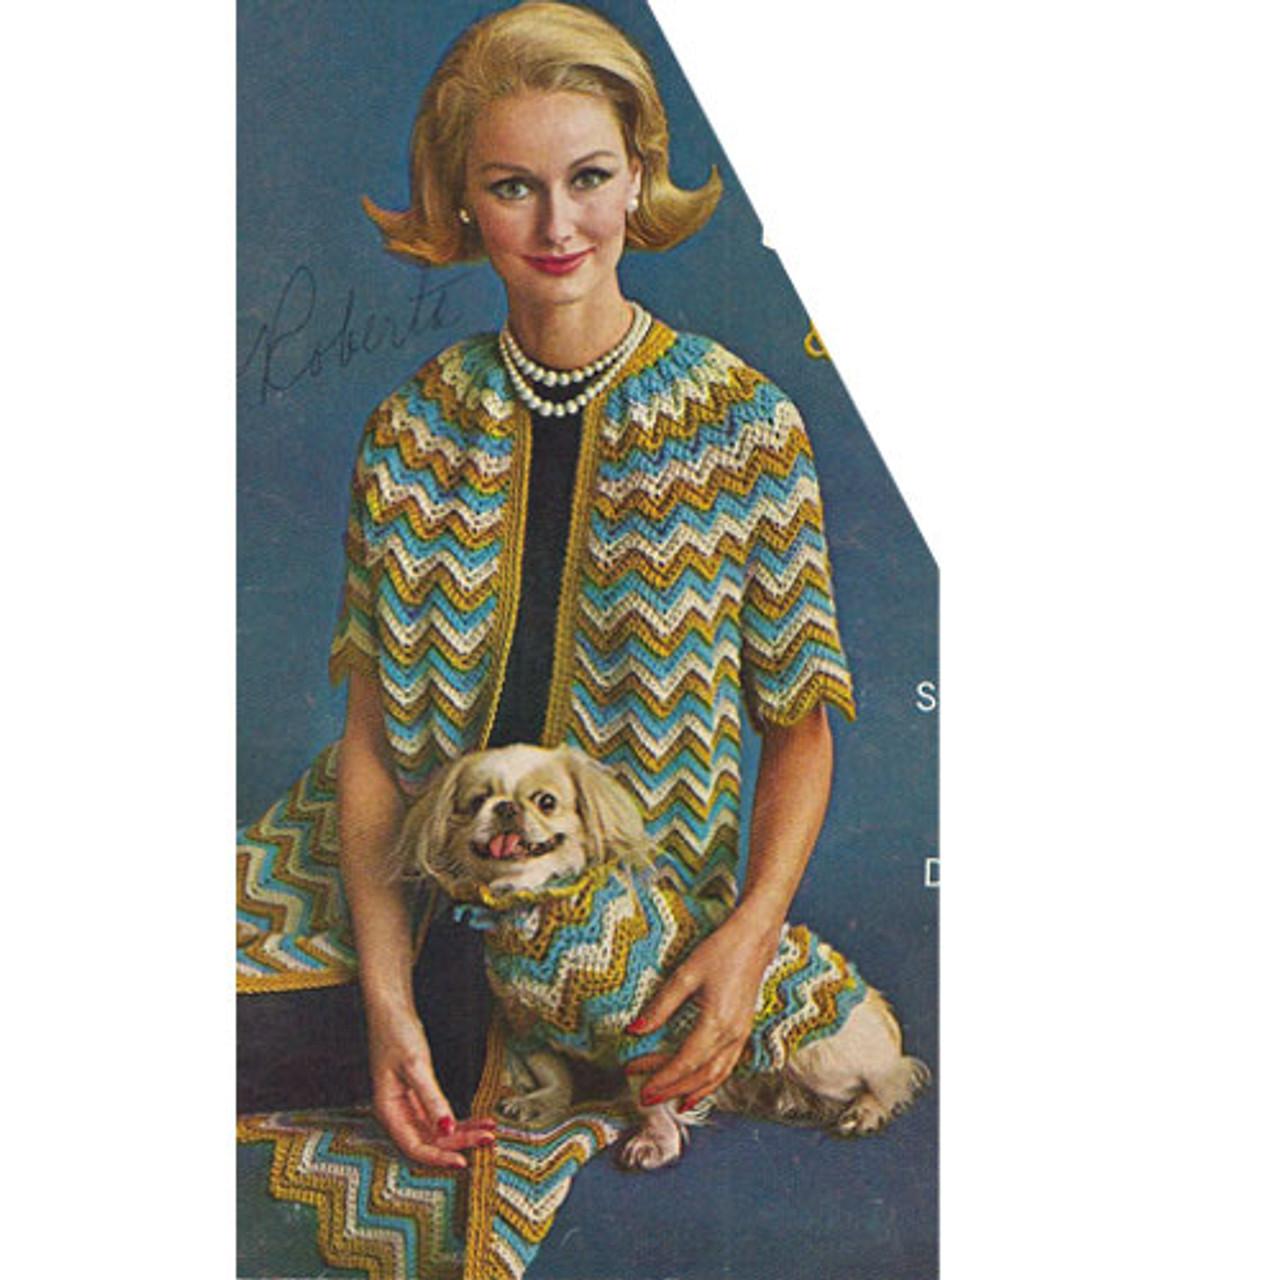 Ripple Coat Crochet Pattern from American Thread